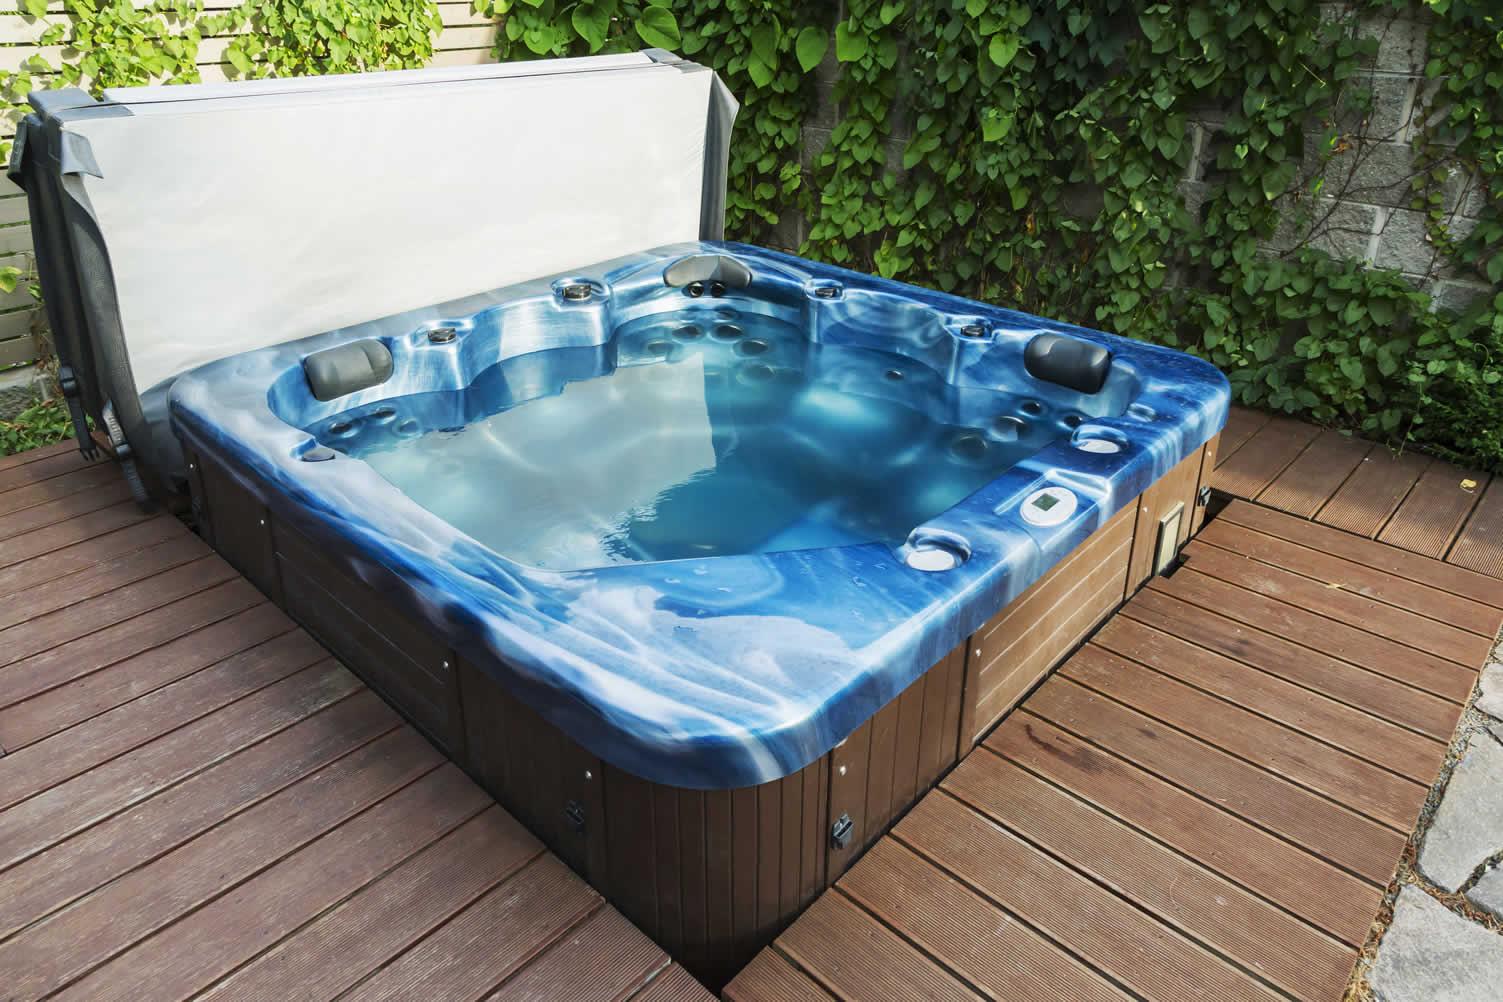 installing a new hot tub